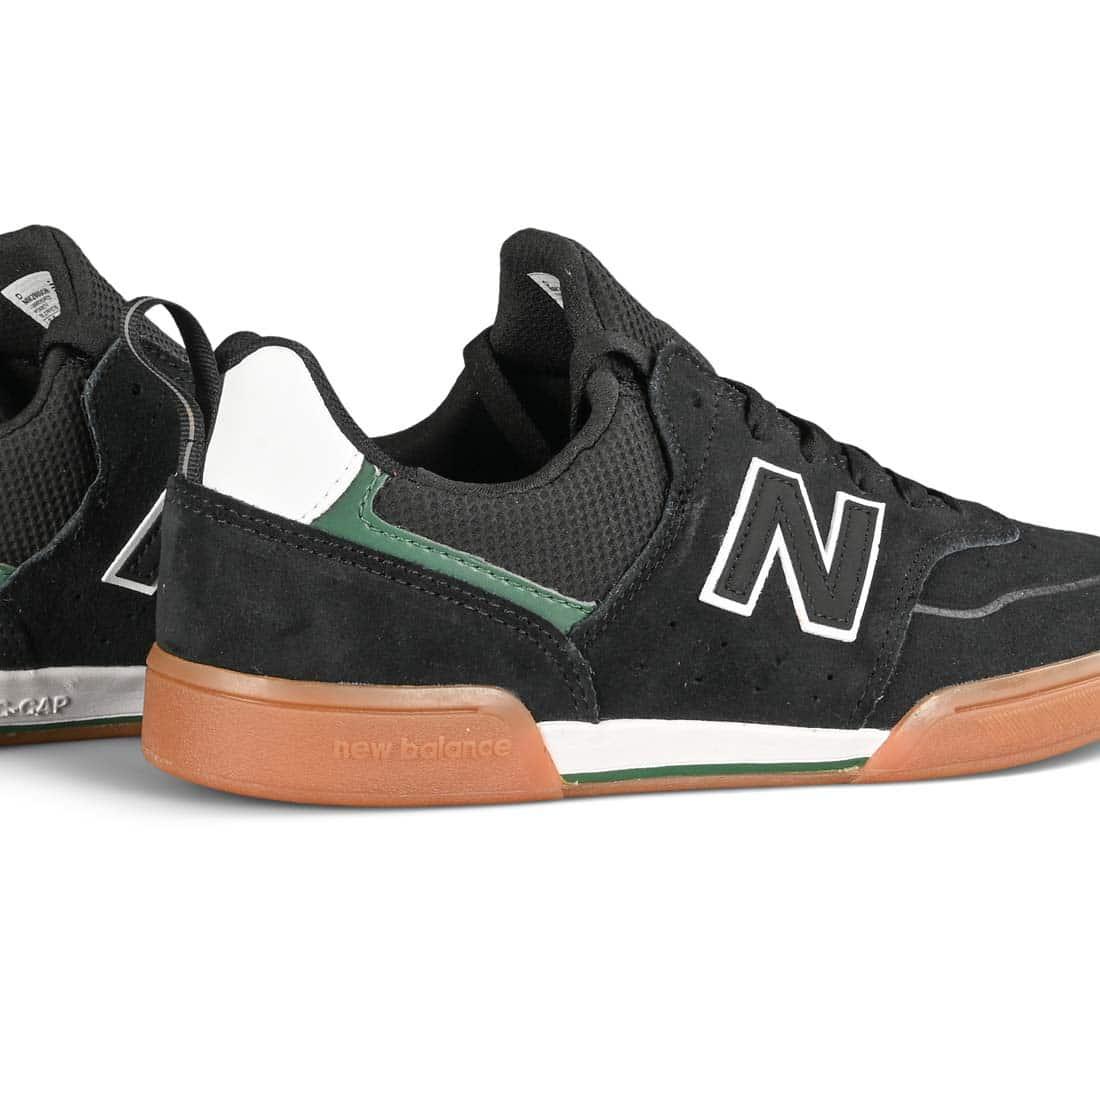 Sacrificio Mar Groenlandia  New Balance Numeric 288 Skate Shoes - Black / Green | Supereight.net